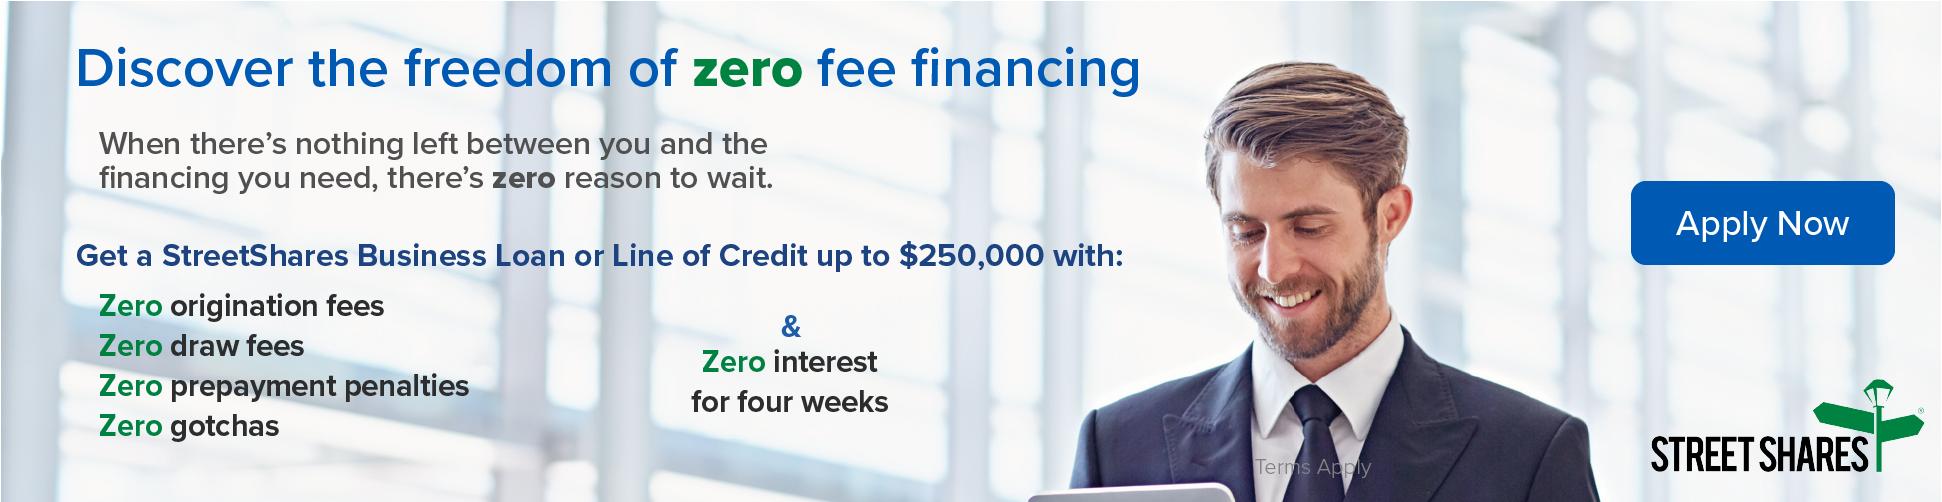 Zero Fee Financing Apply